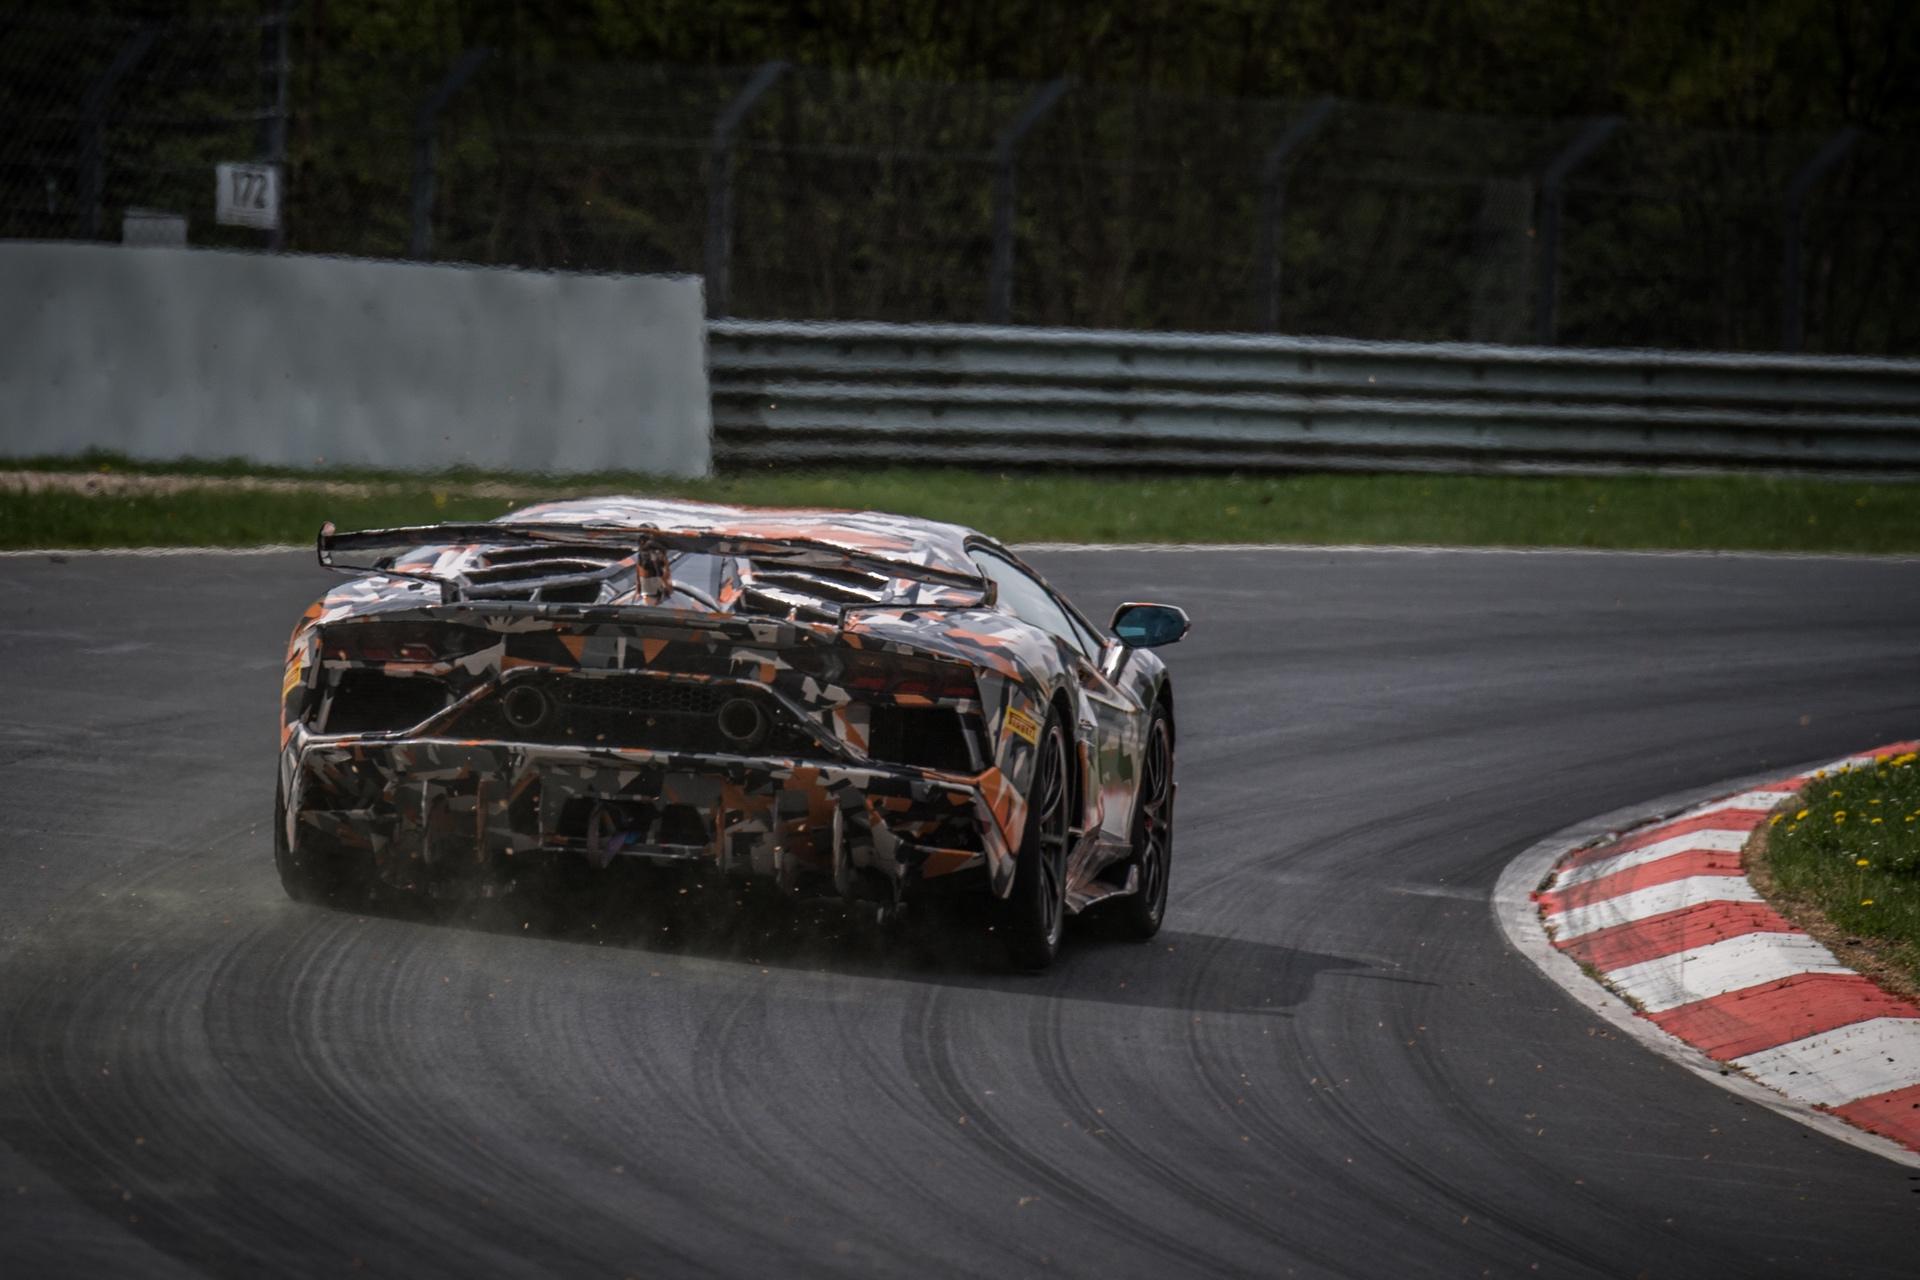 Lamborghini_Aventador_SVJ_Nurburgring_0004